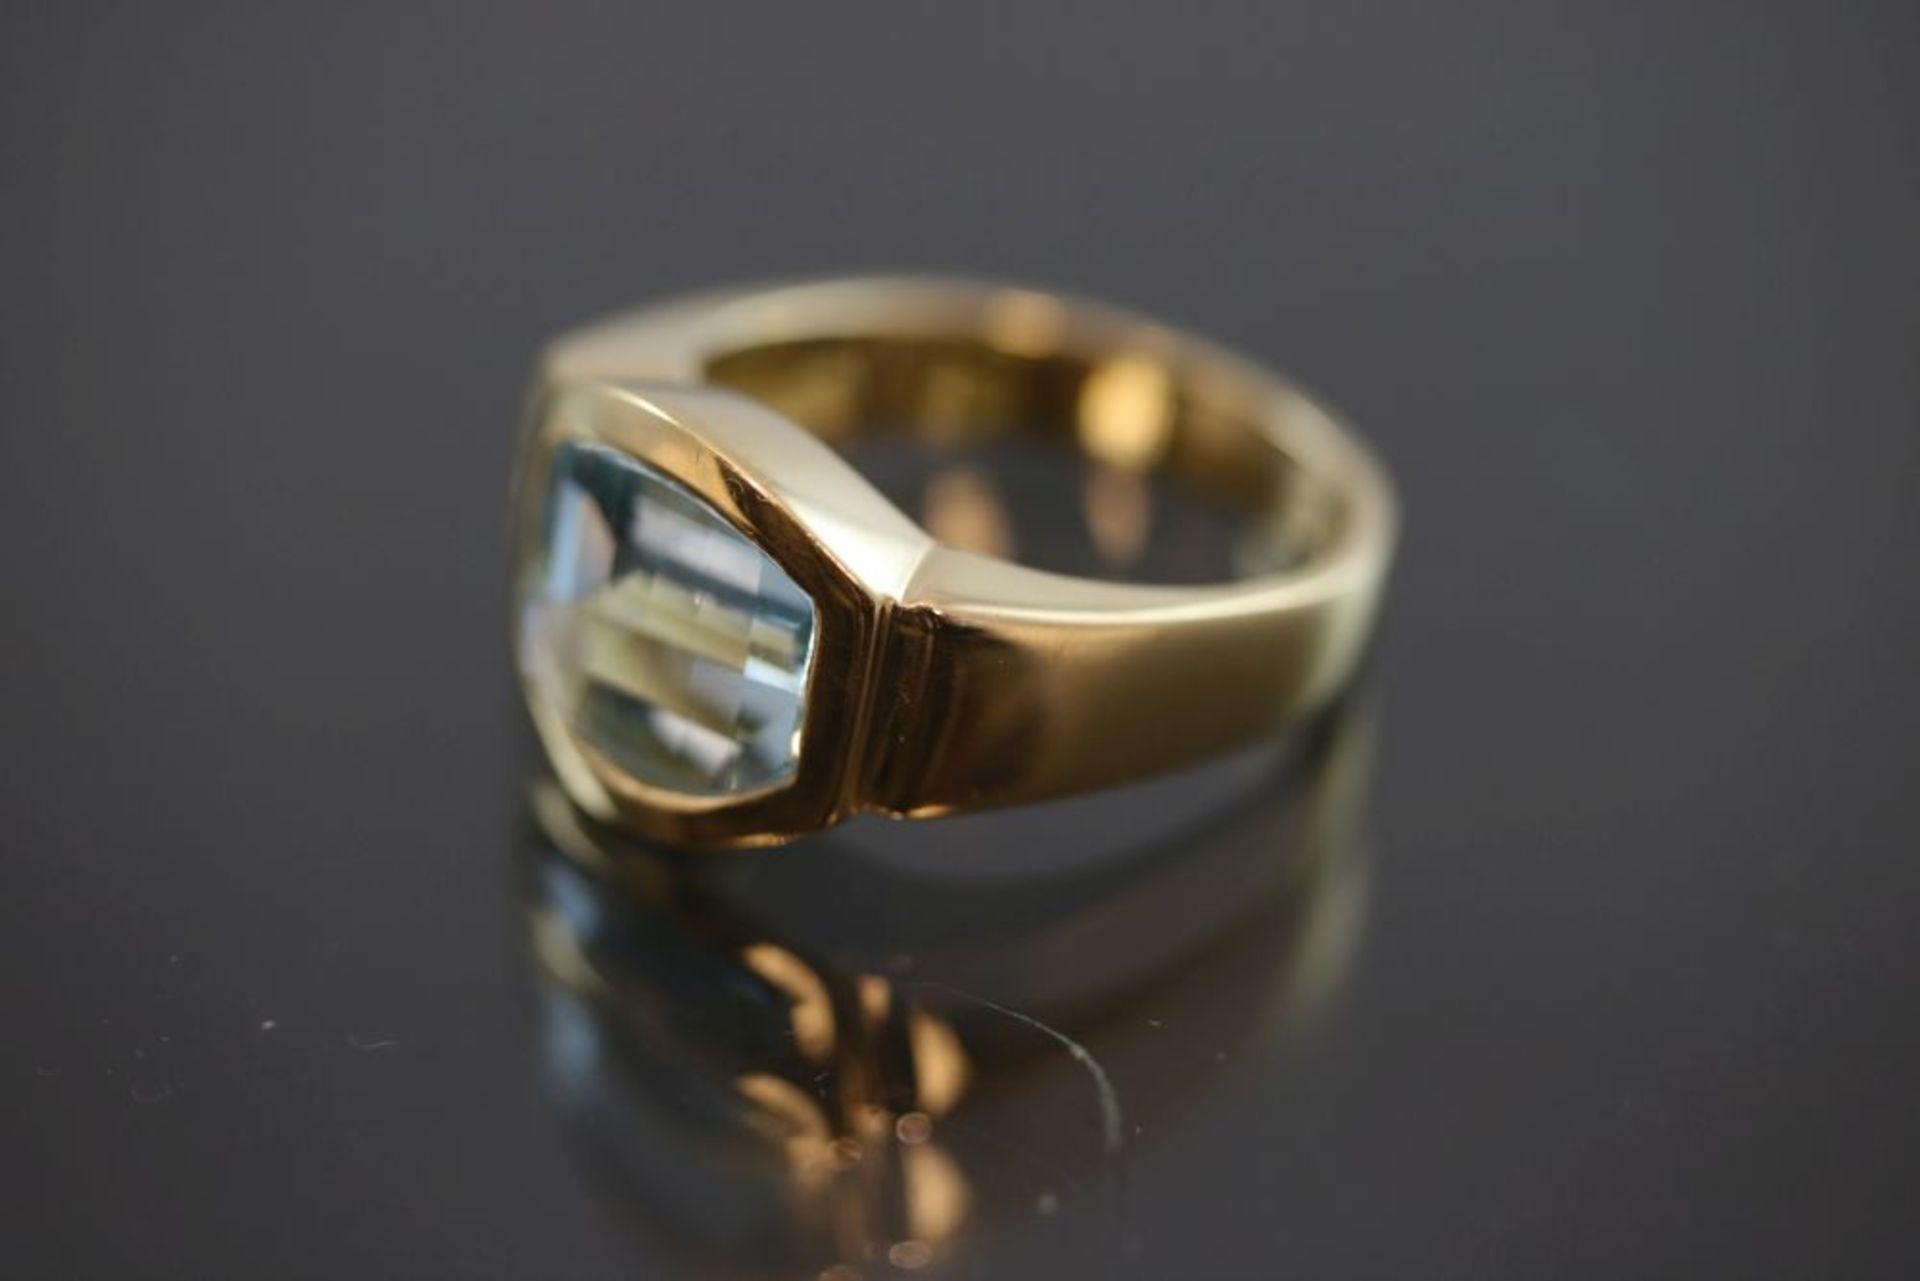 Aquamarin-Brillant-Ring, 750 Gold 9,6 - Image 2 of 3